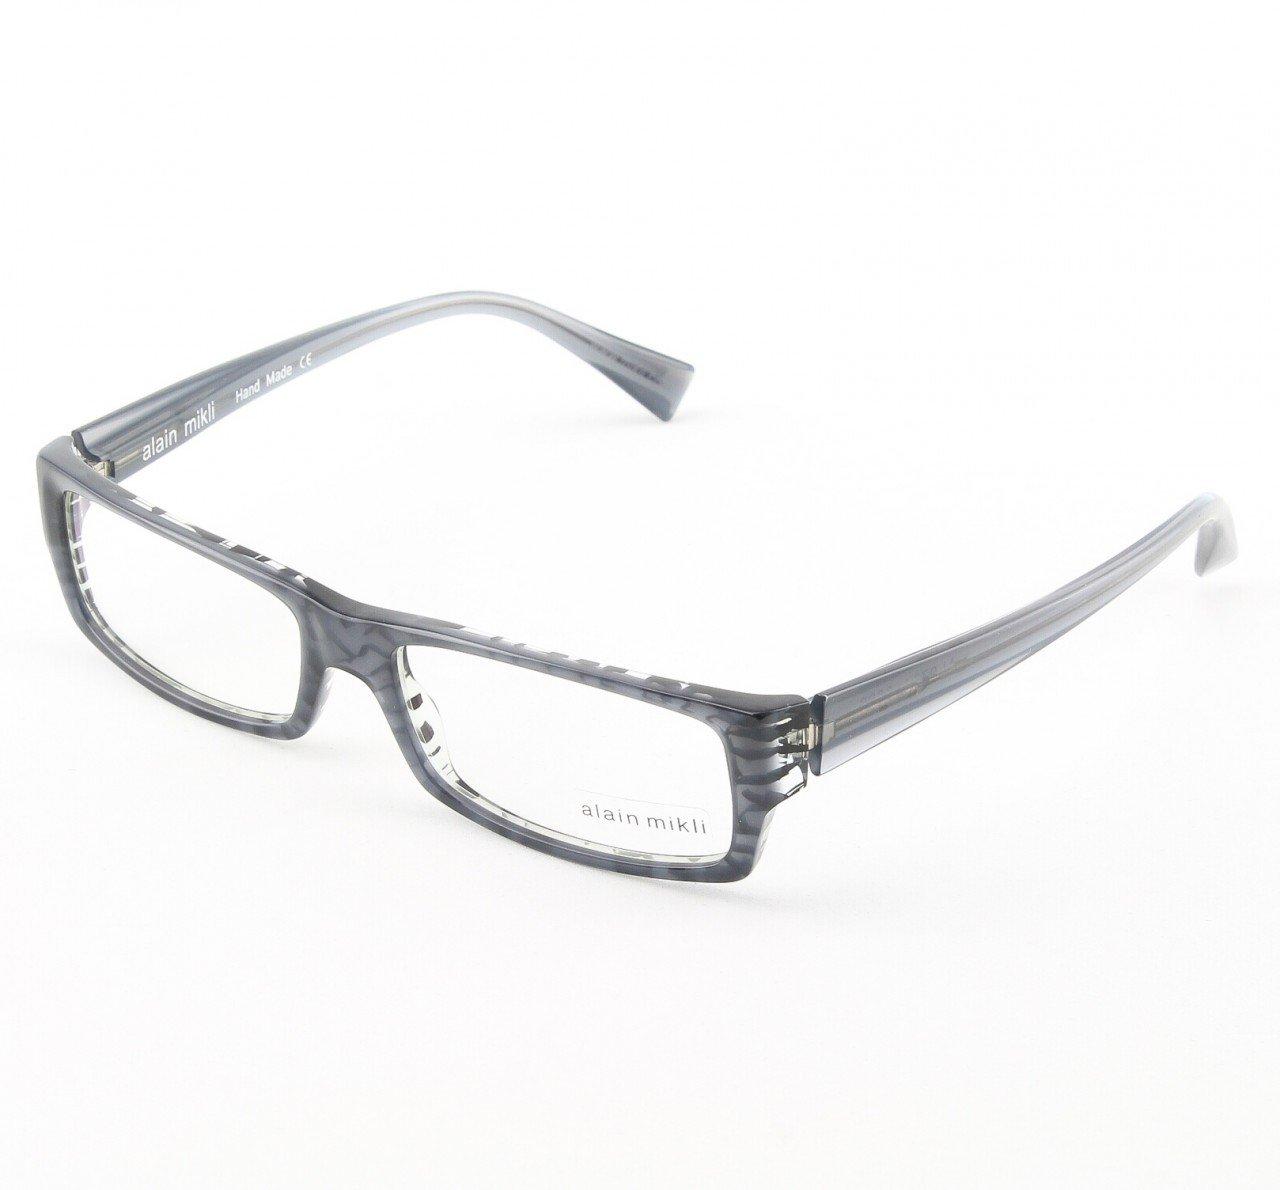 Alain Mikli Eyeglasses AL0704 Col. 23 Luminescent Gray and Black